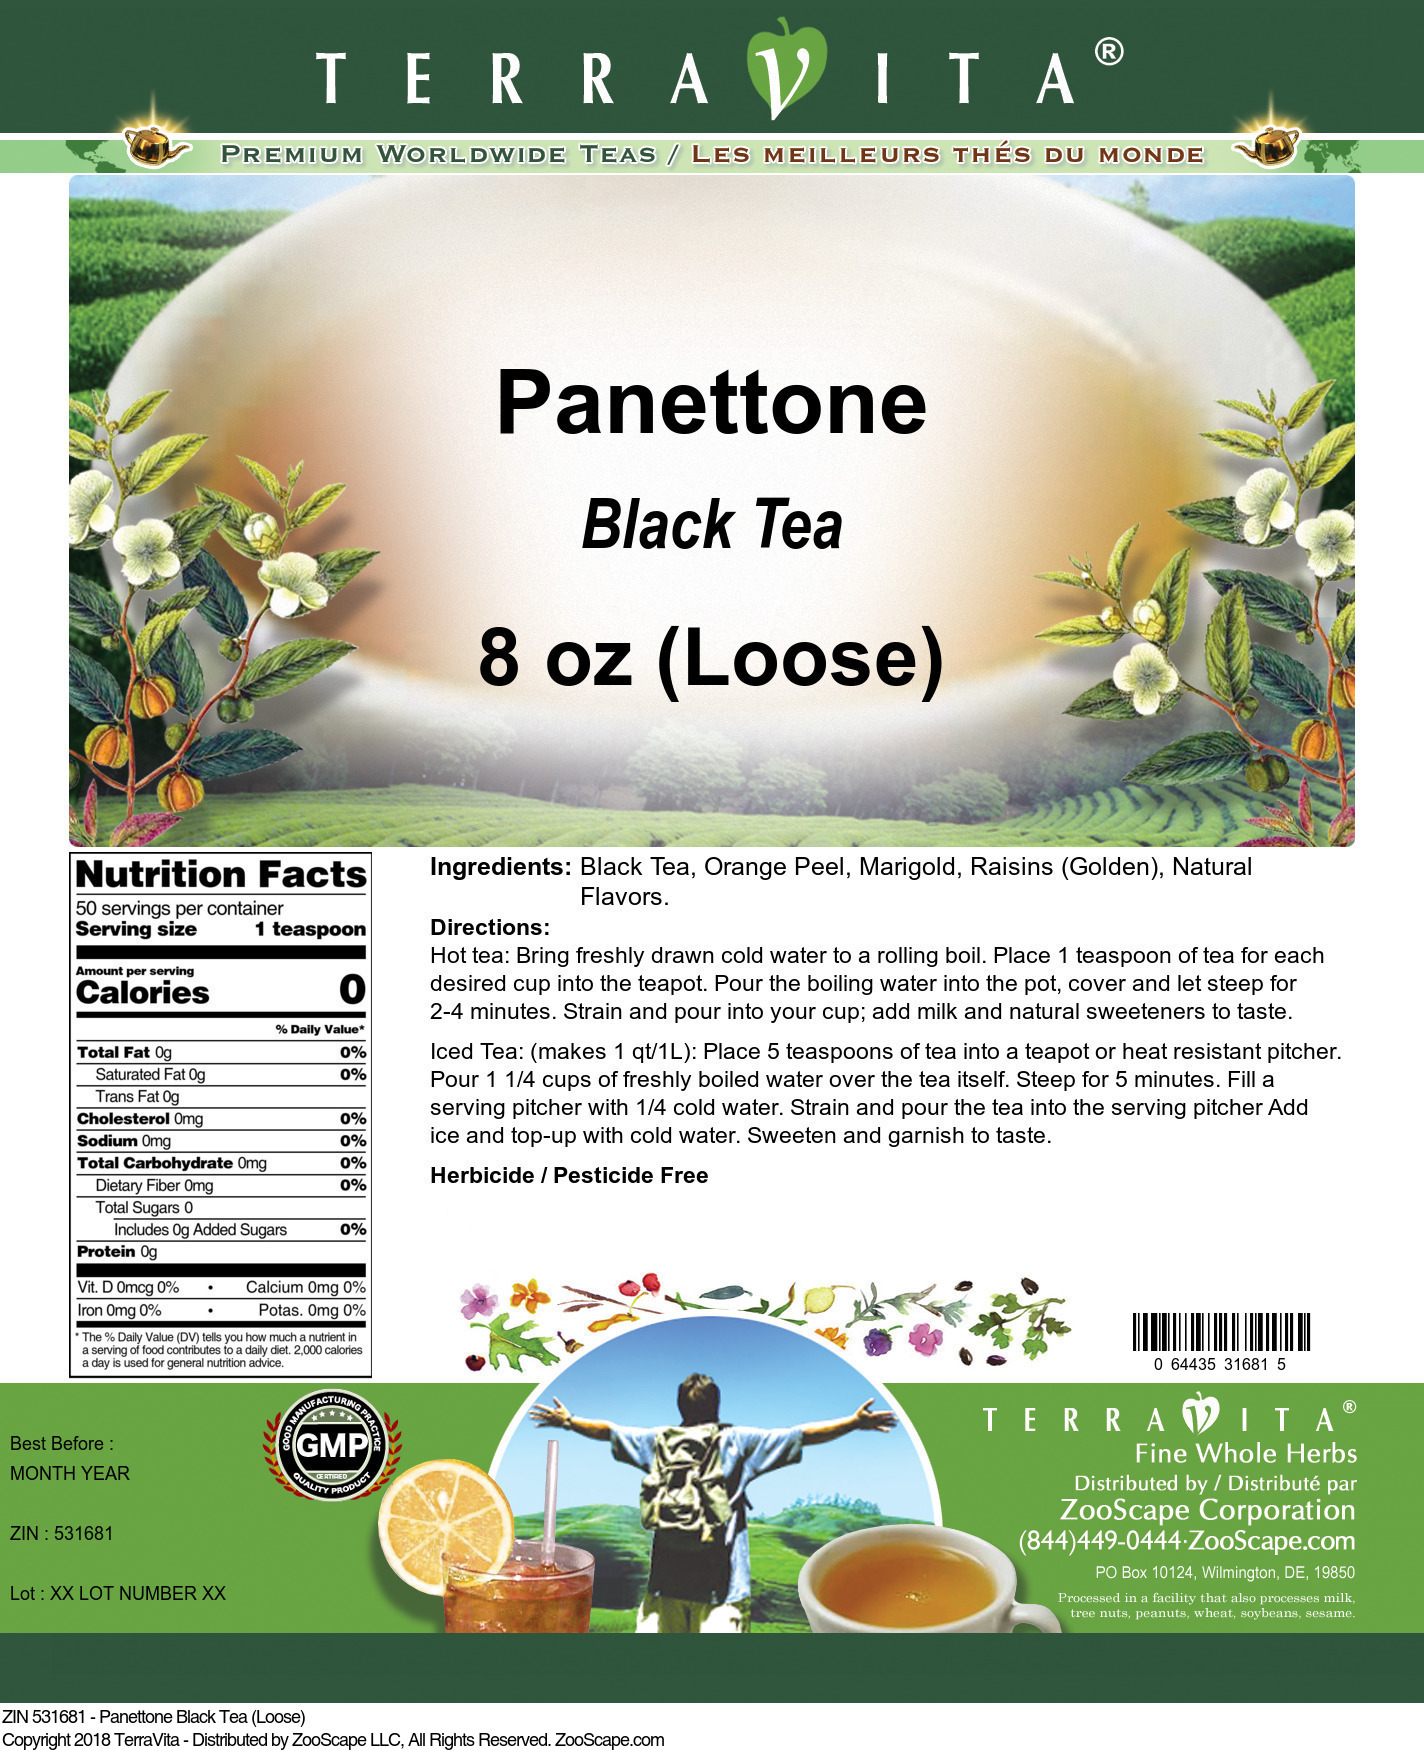 Panettone Black Tea (Loose)